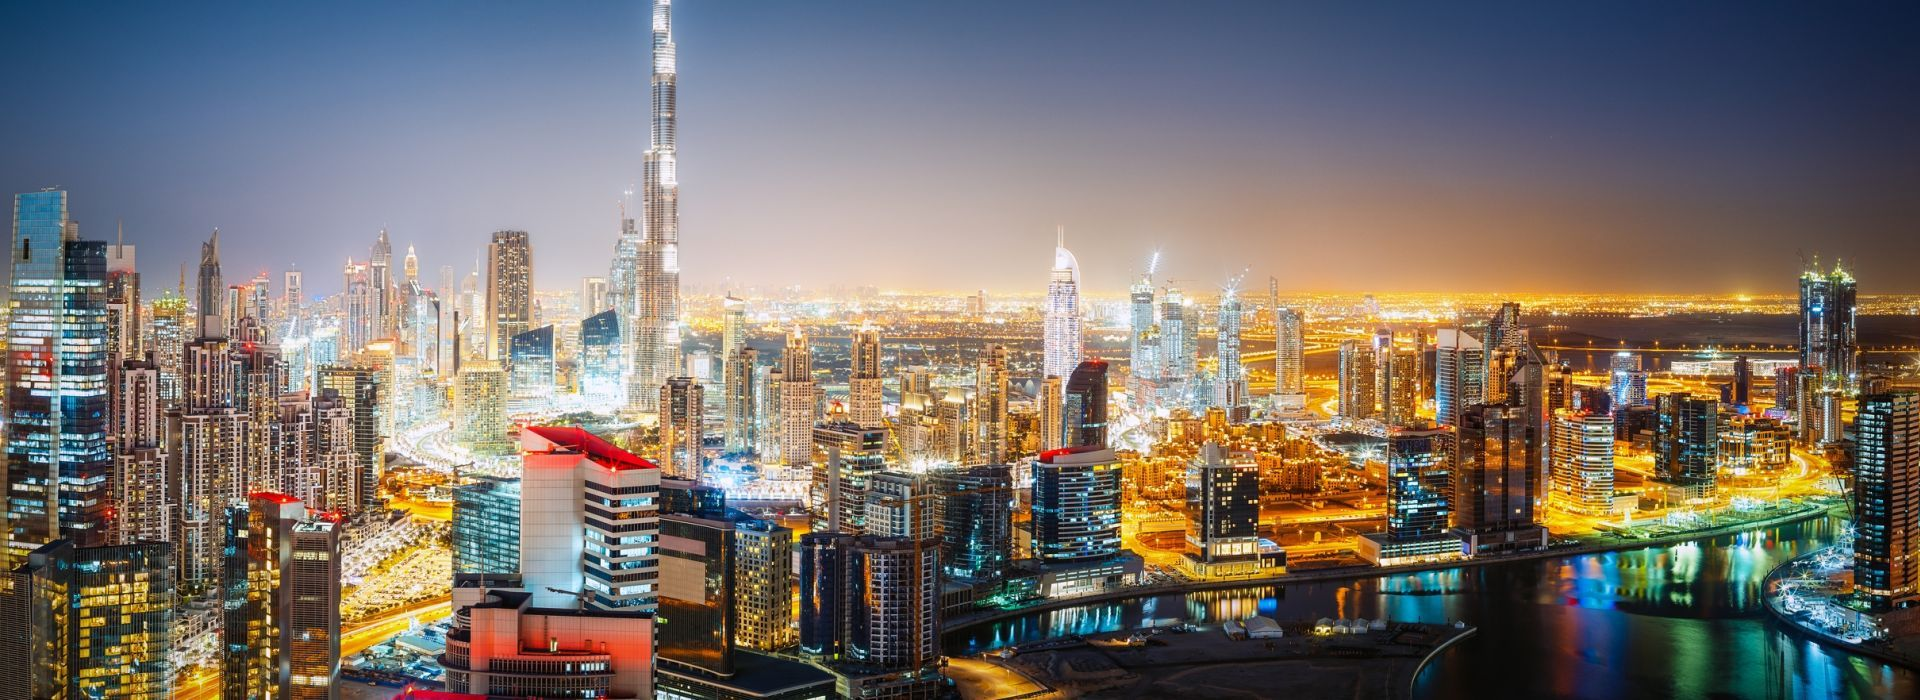 4x4, quad and ATV trips Tours in Dubai